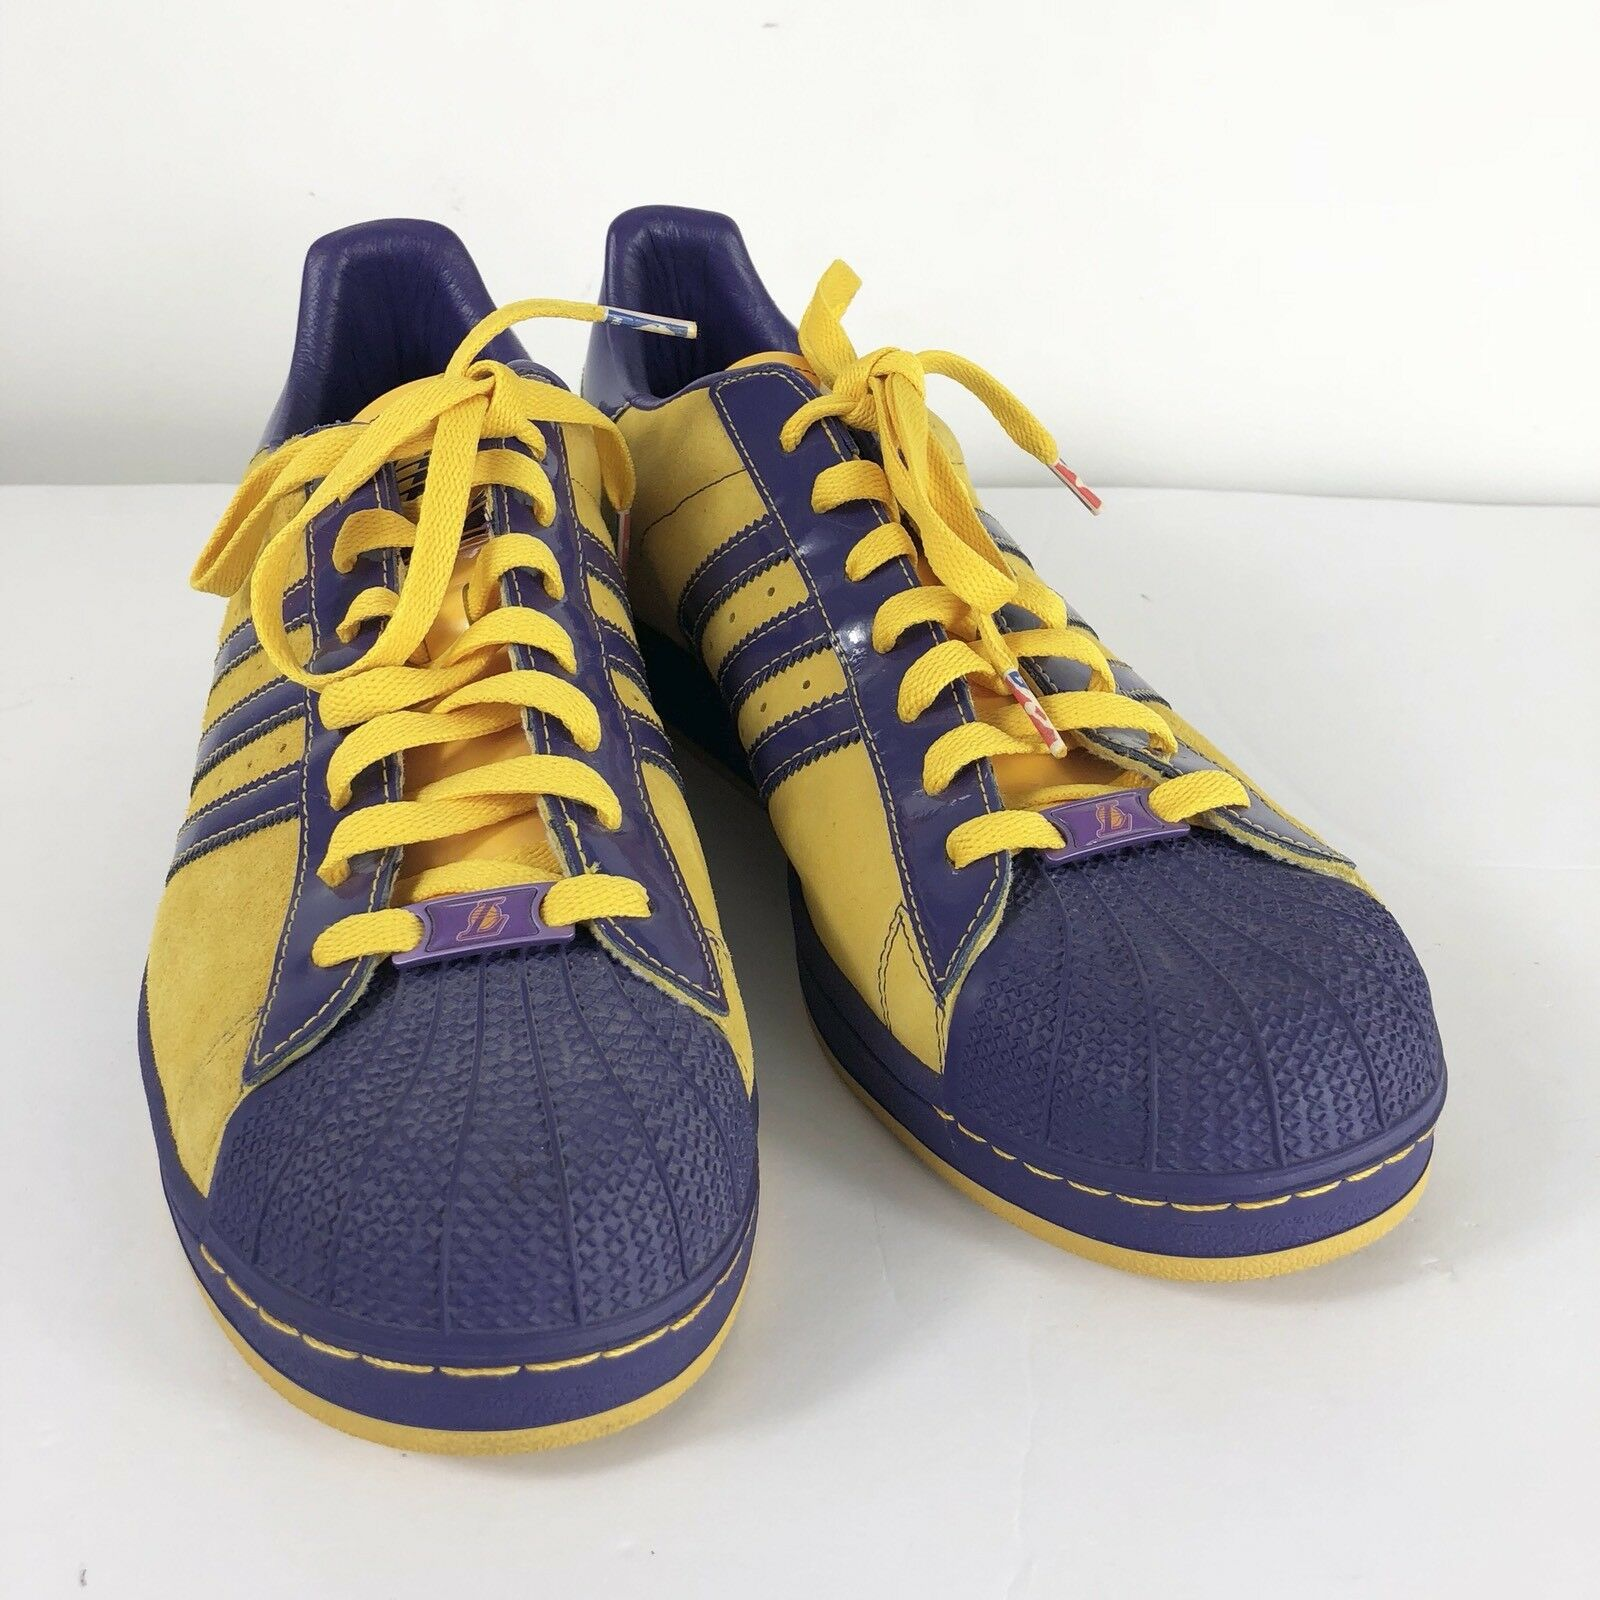 ADIDAS SUPERSTAR Mens sz 14 LOS ANGELES LAKERS NBA Series Basketball shoes